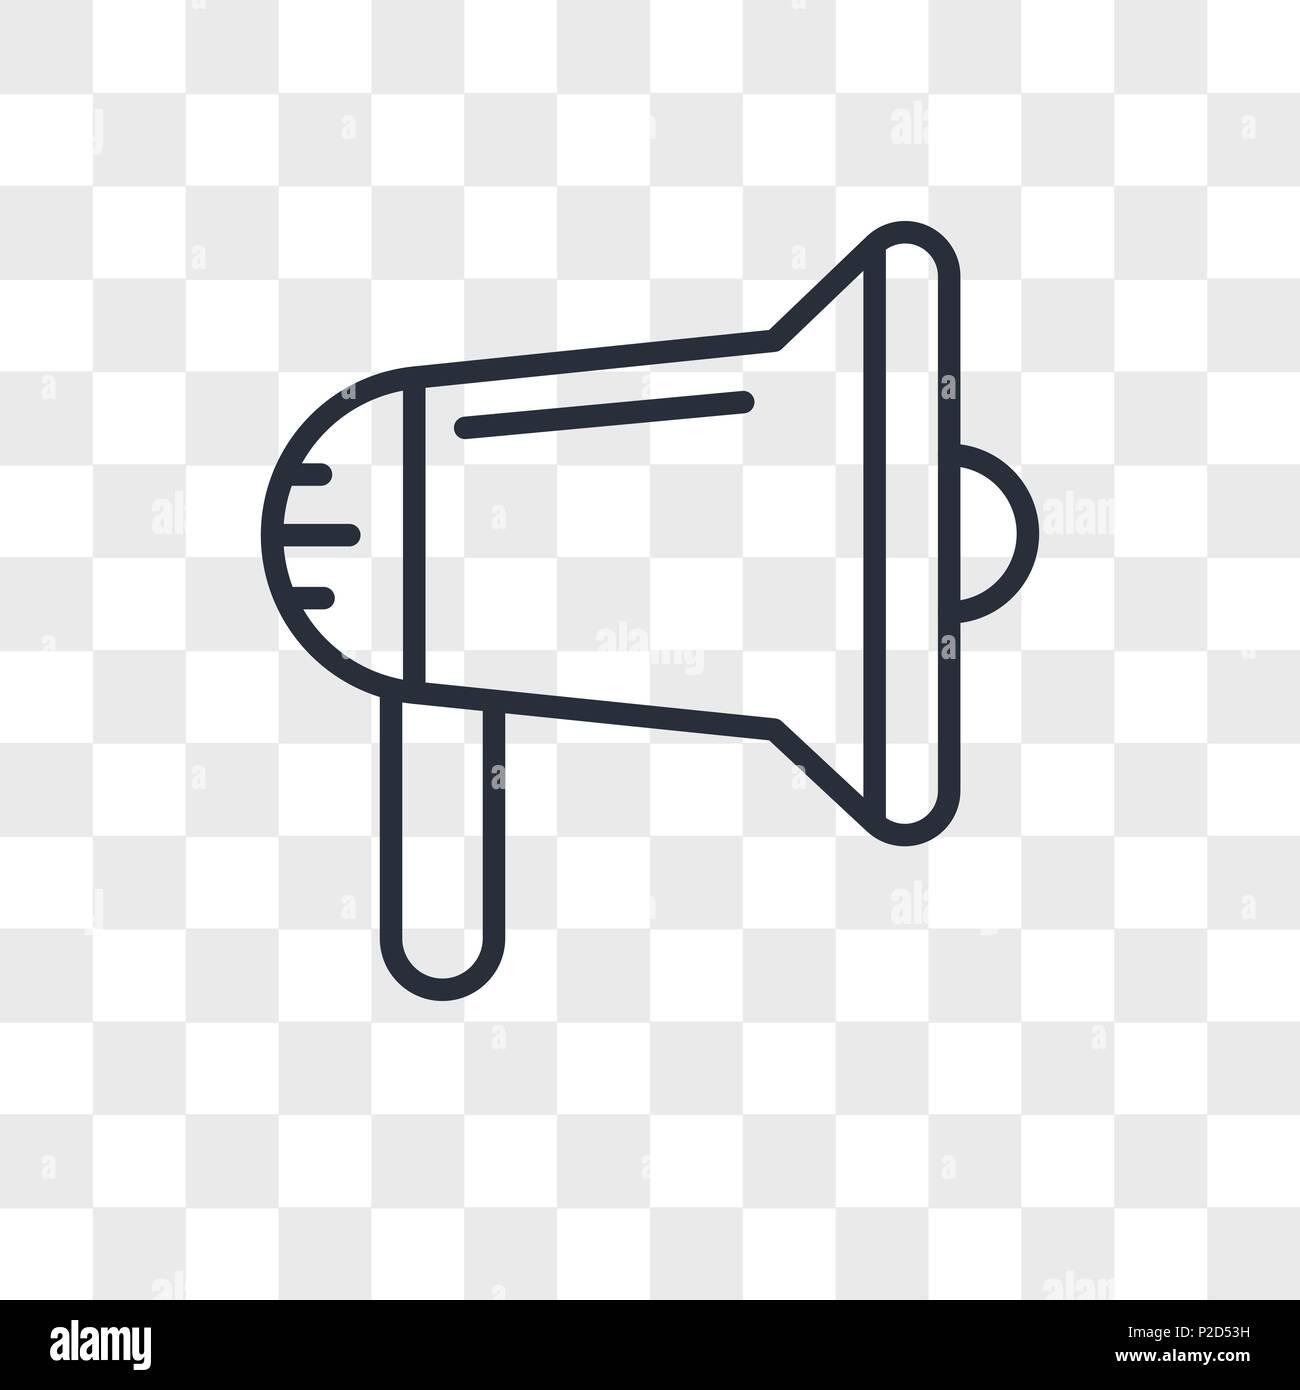 loudspeaker vector icon isolated on transparent background loudspeaker logo concept stock vector image art alamy https www alamy com loudspeaker vector icon isolated on transparent background loudspeaker logo concept image208043125 html